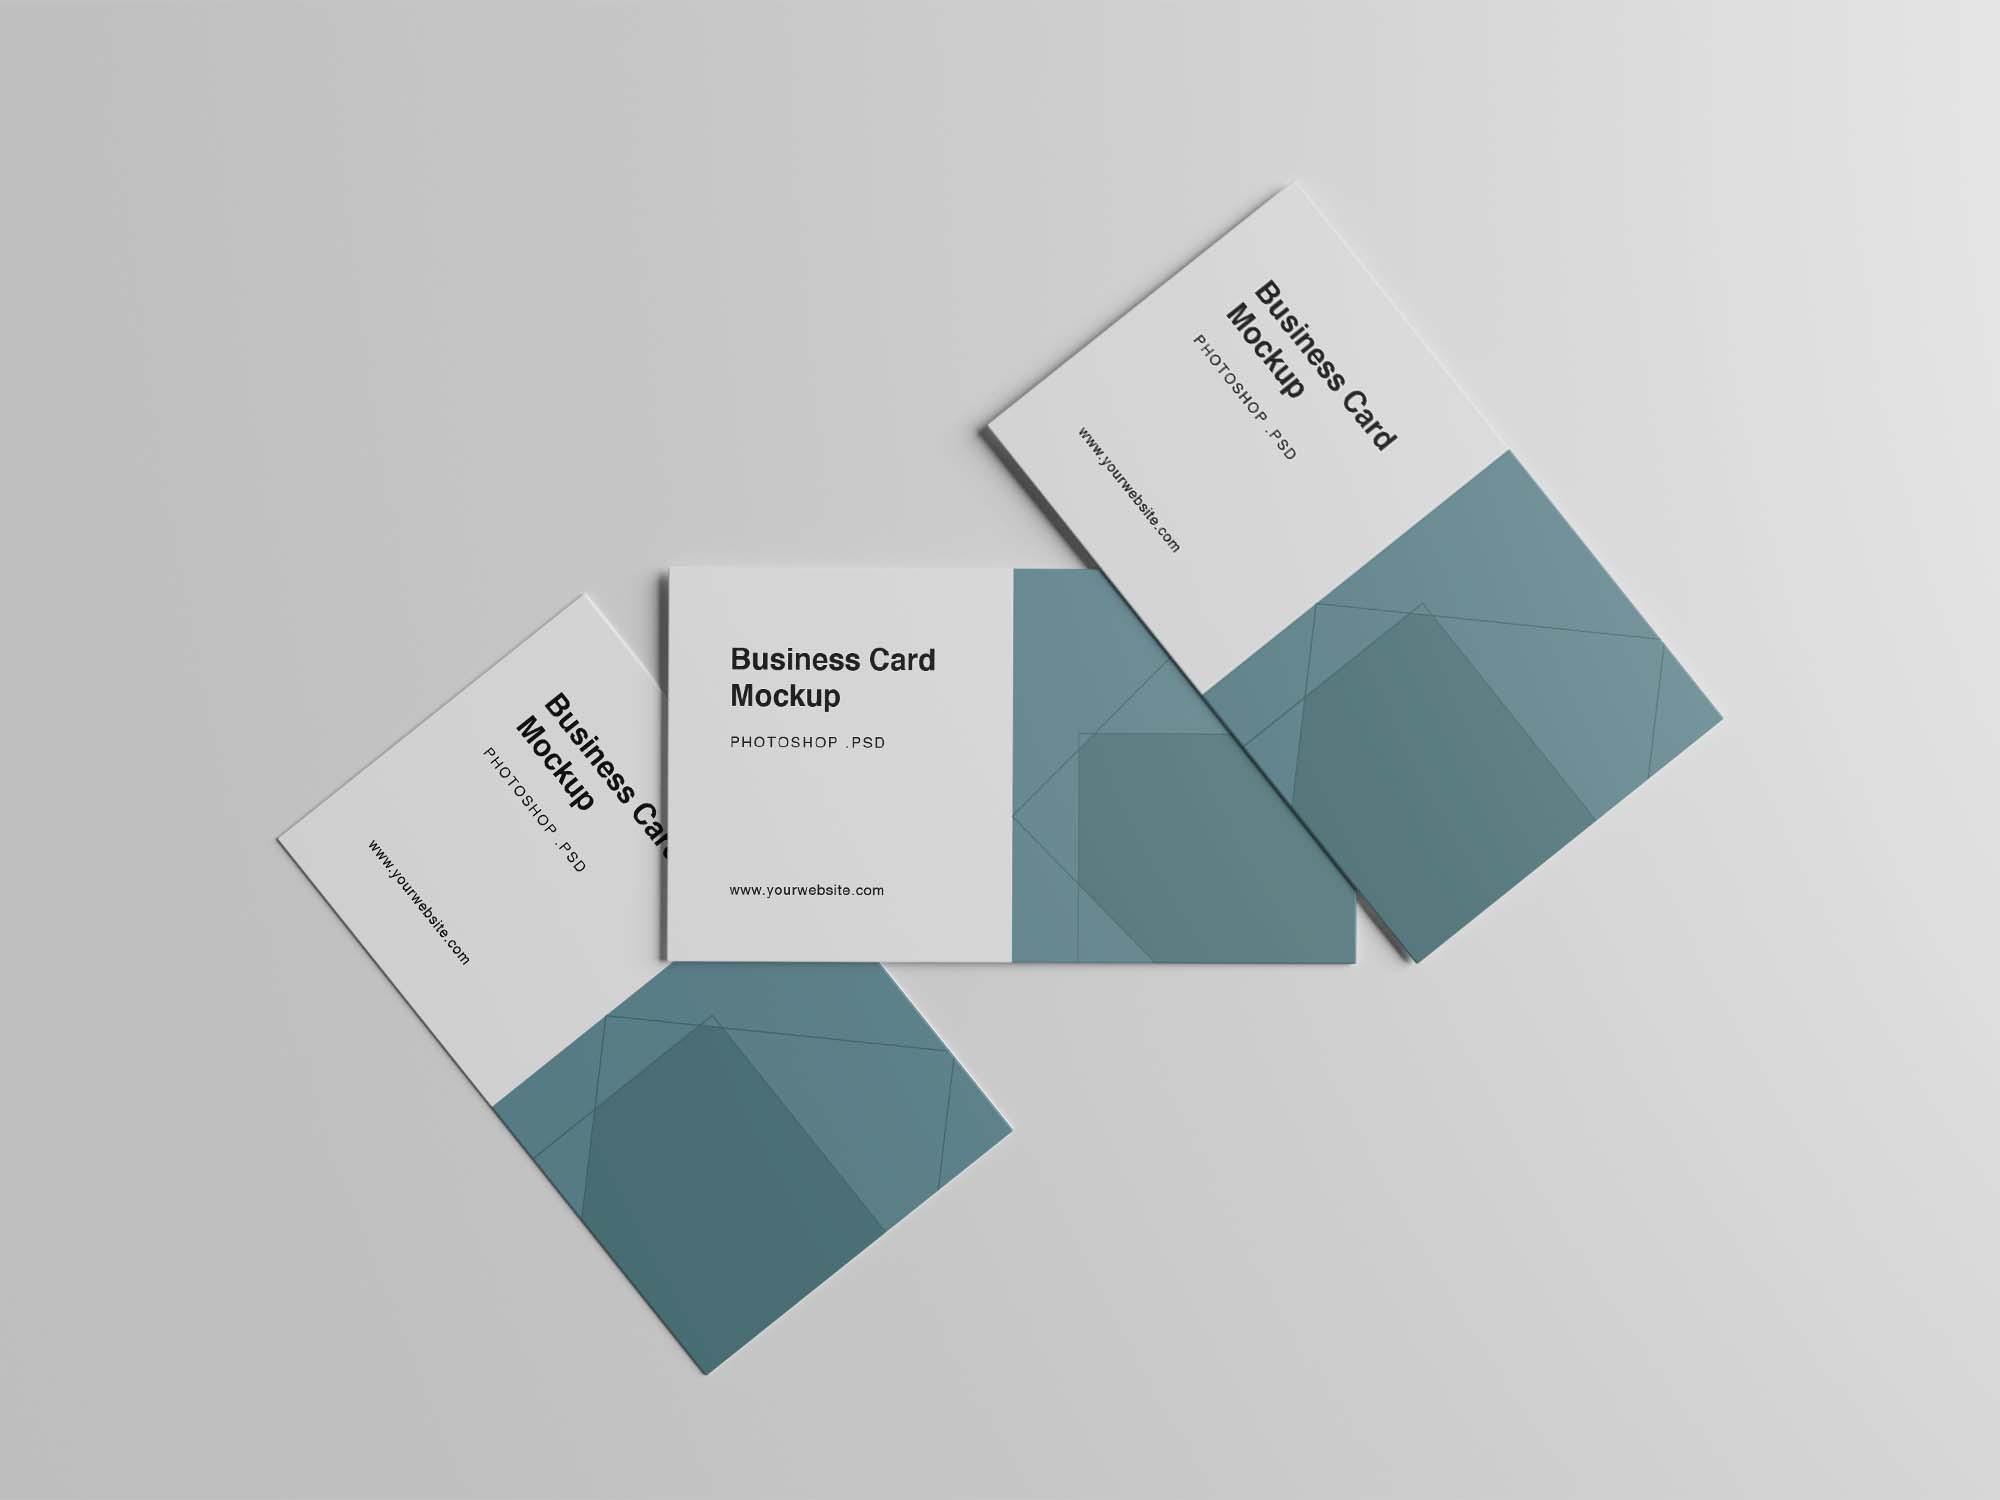 Three Business Card Mockups